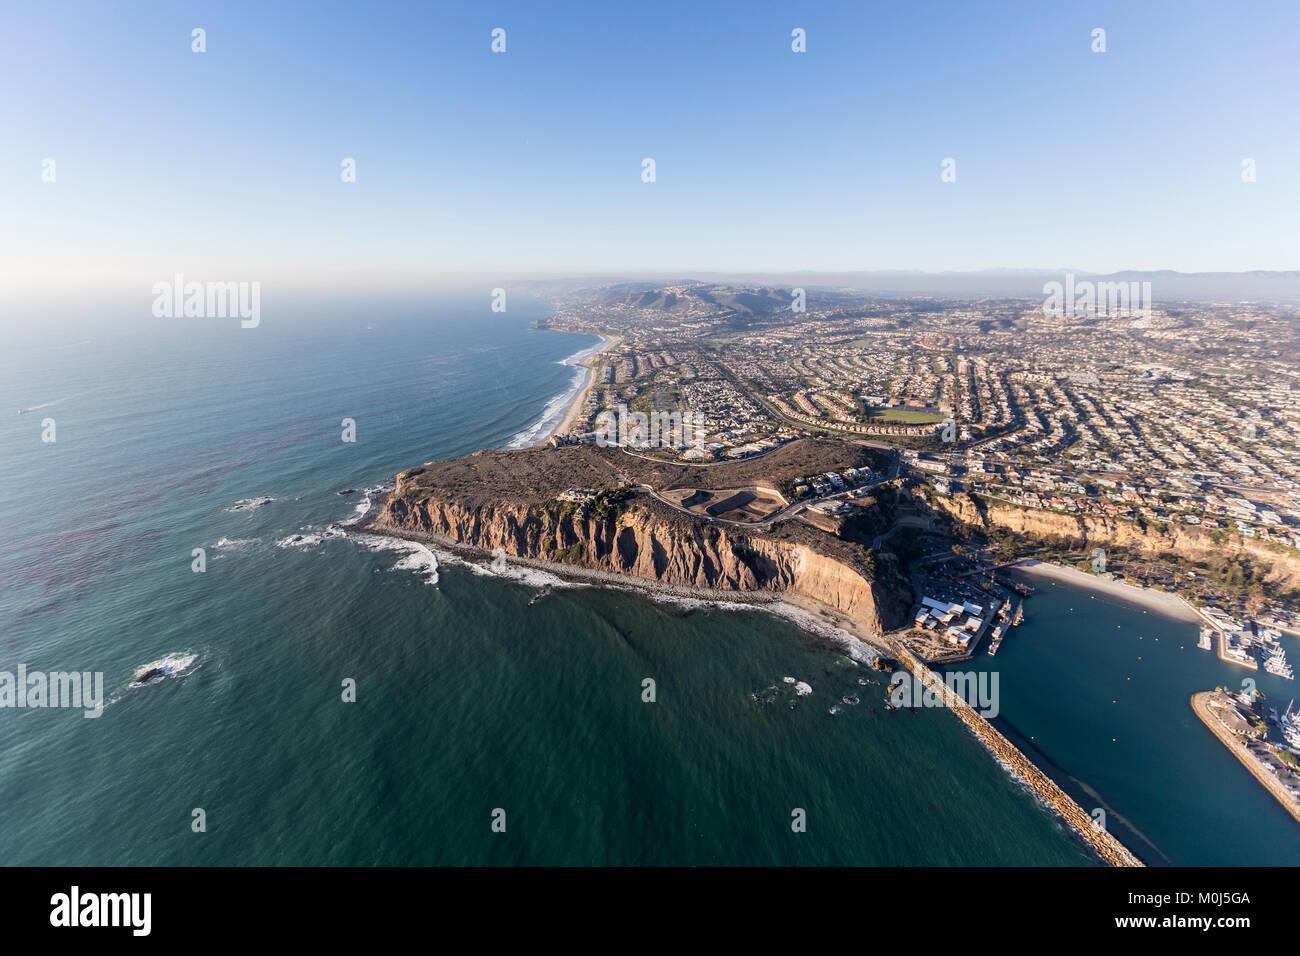 Aerial view of pacific ocean shoreline in Dana Point, California. - Stock Image